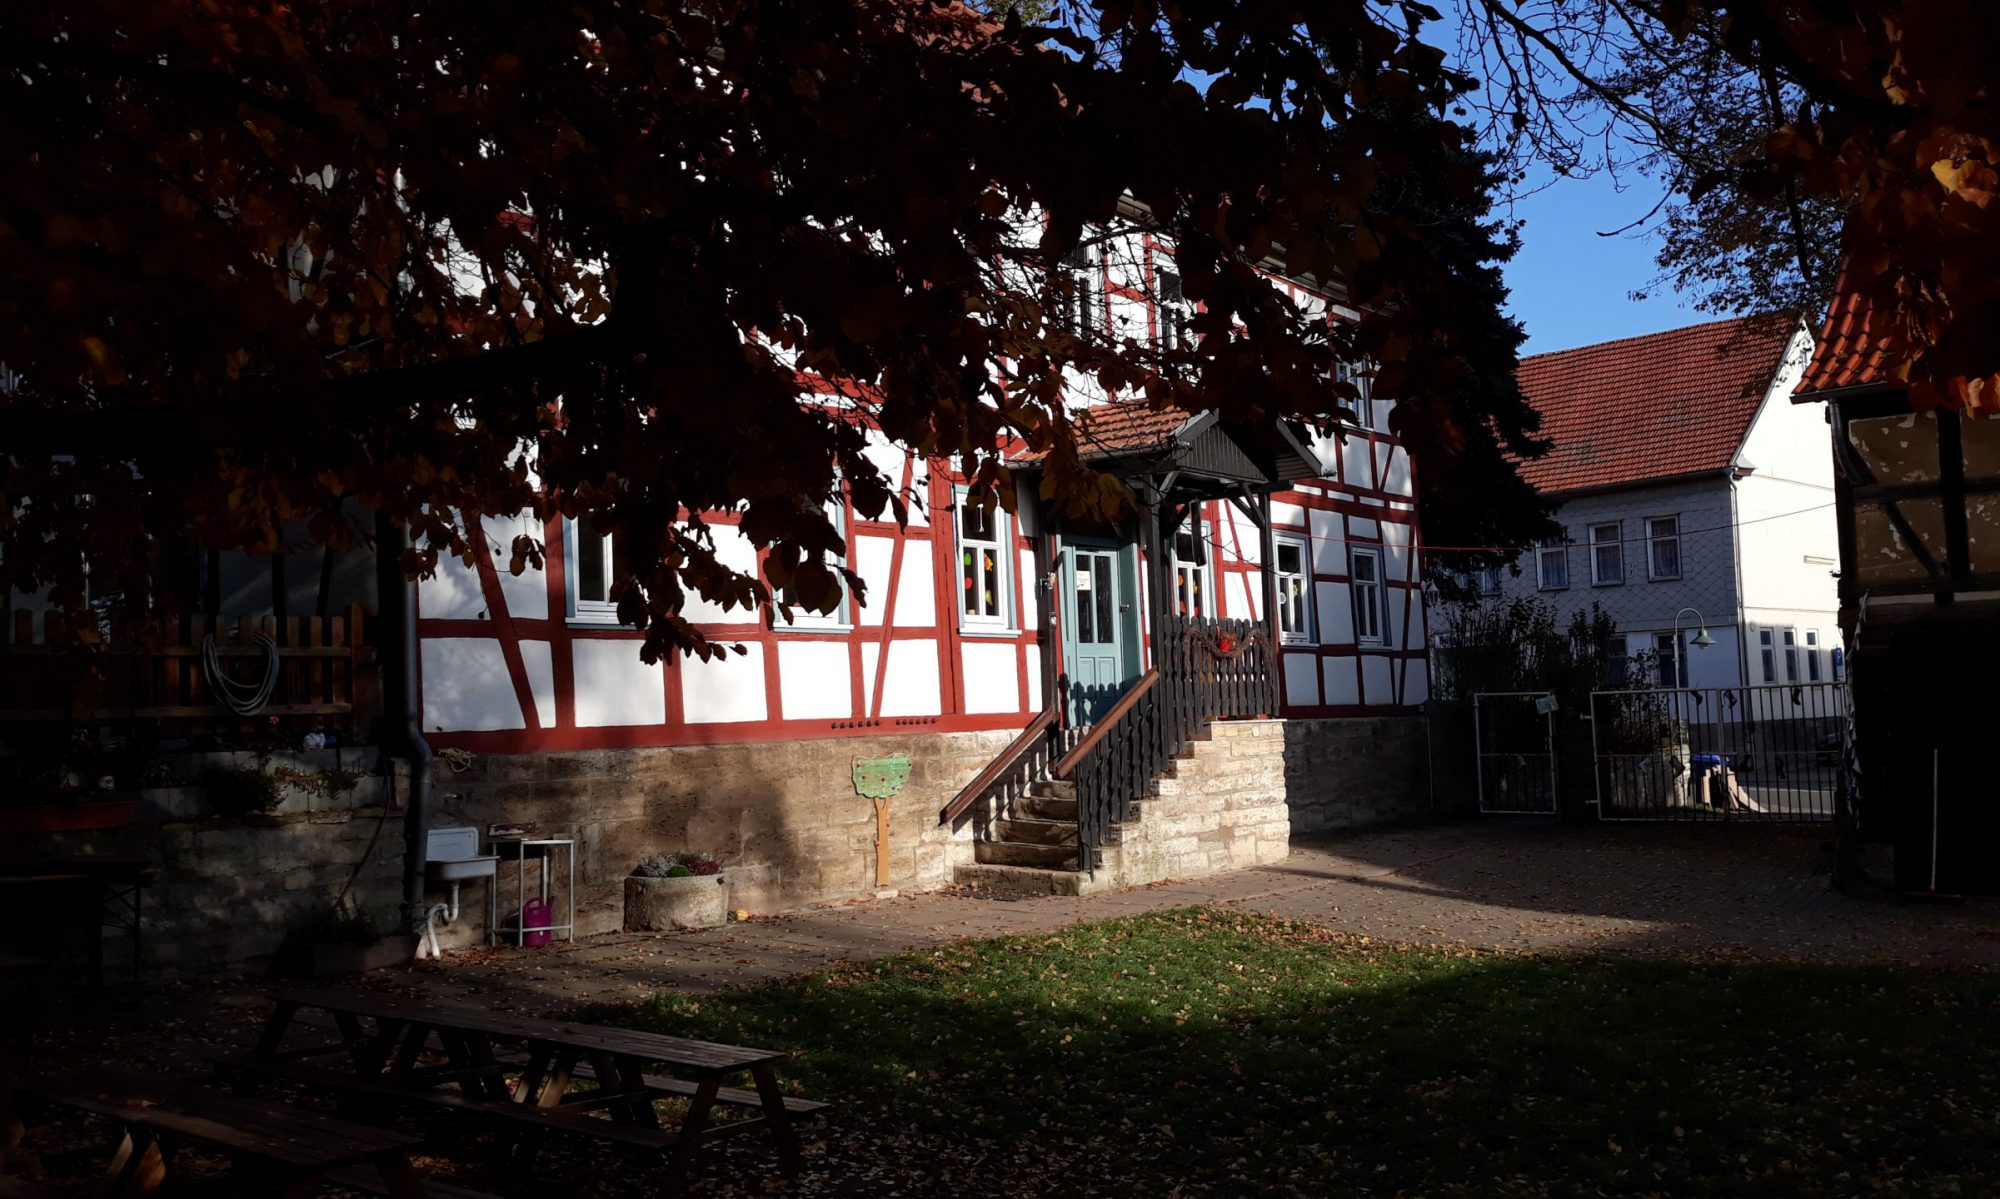 Evangelischer Kindergarten Grabe